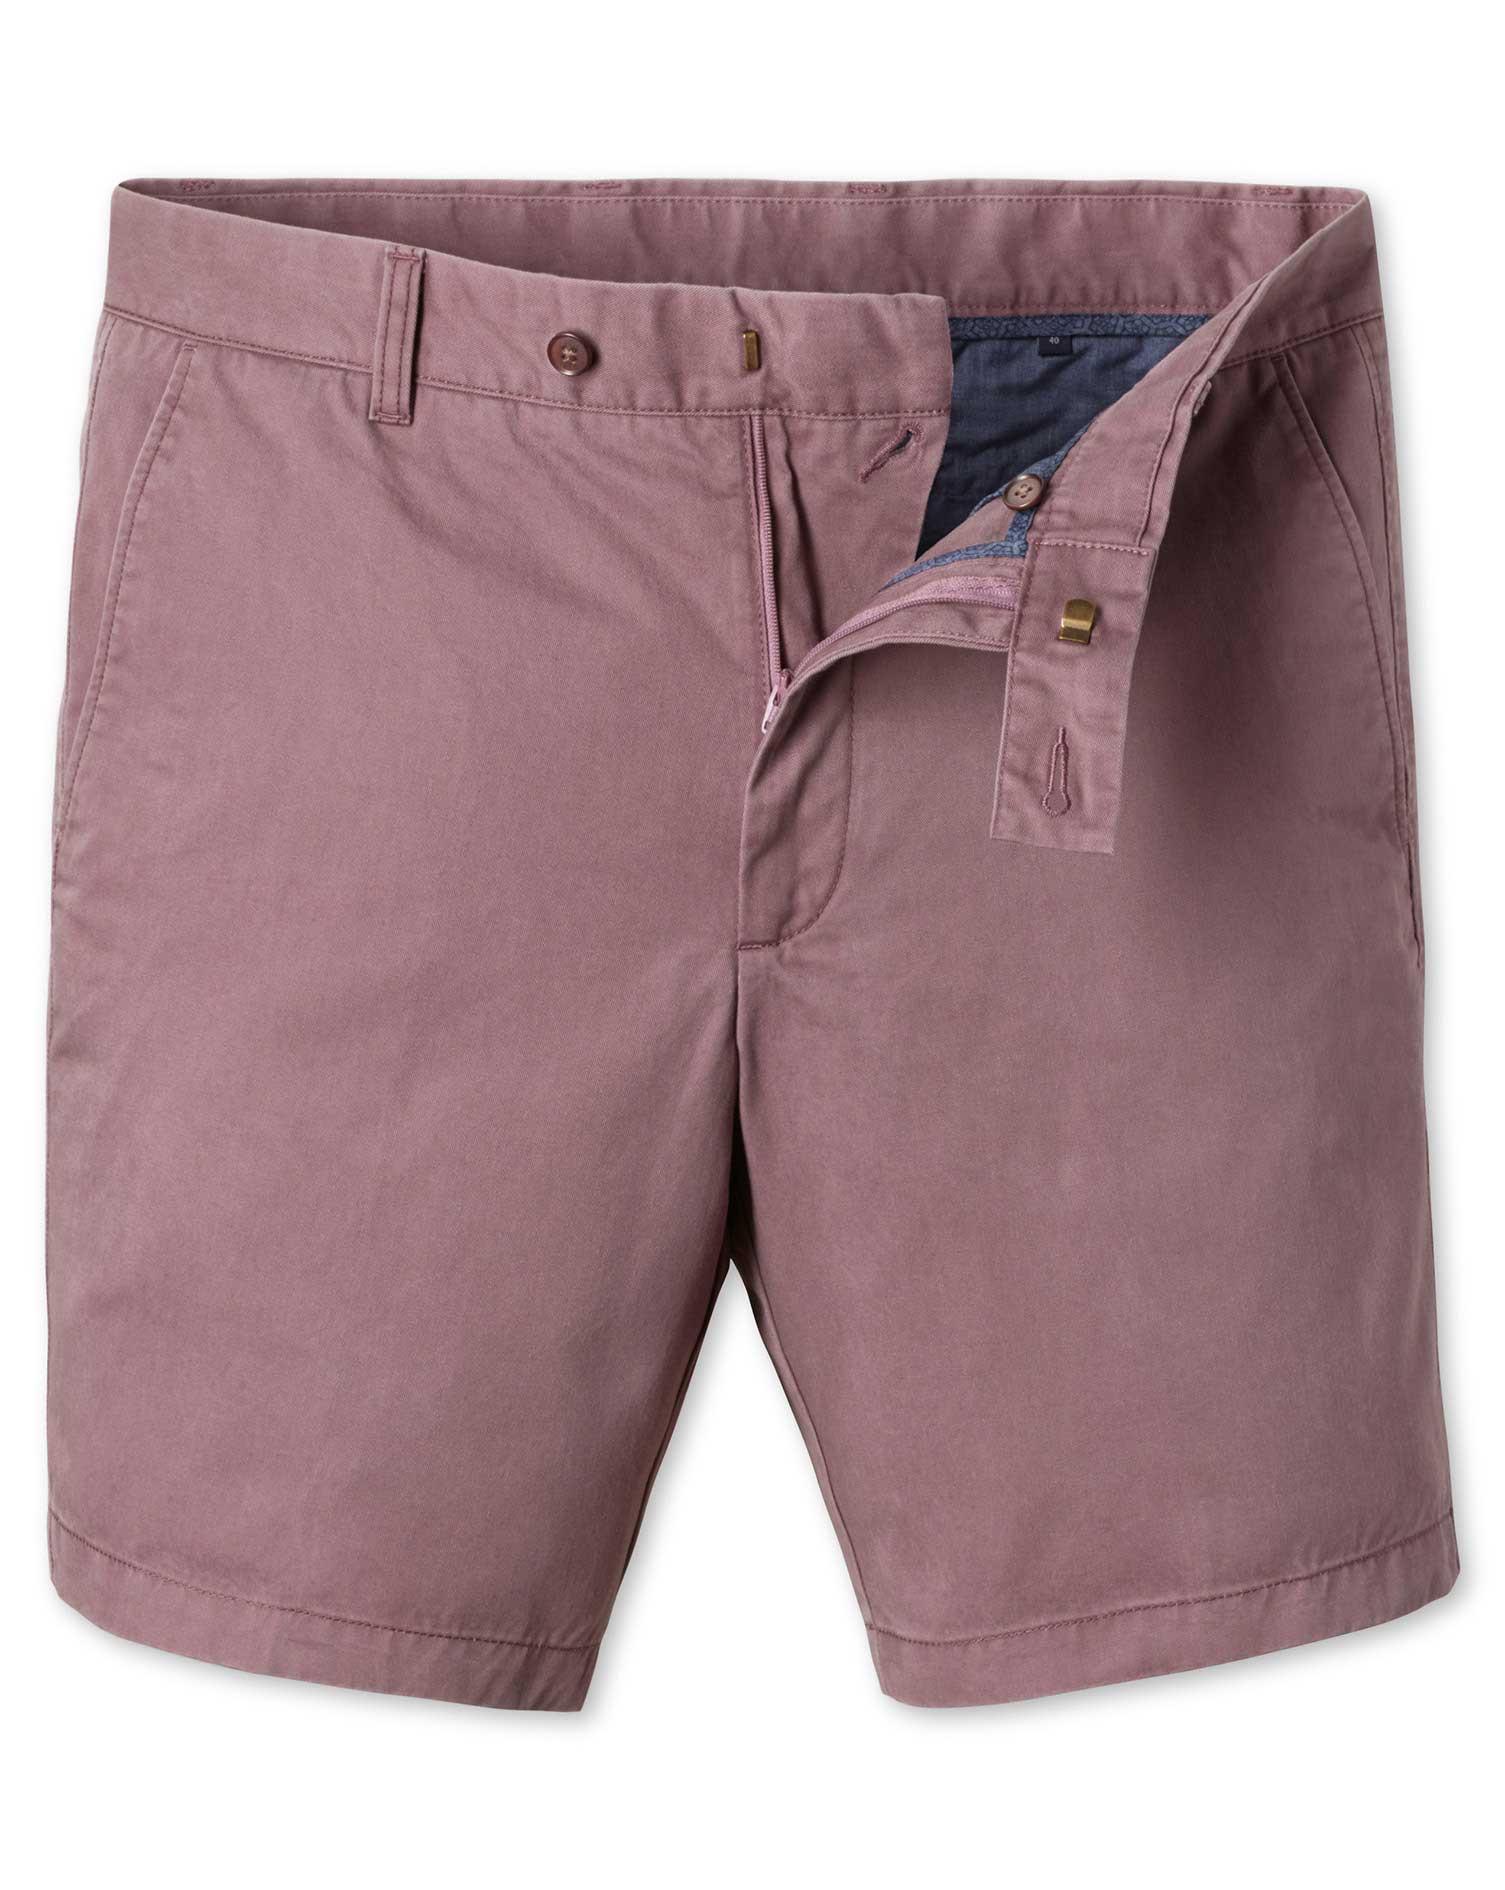 Light Pink Chino Cotton Shorts Size 30 by Charles Tyrwhitt